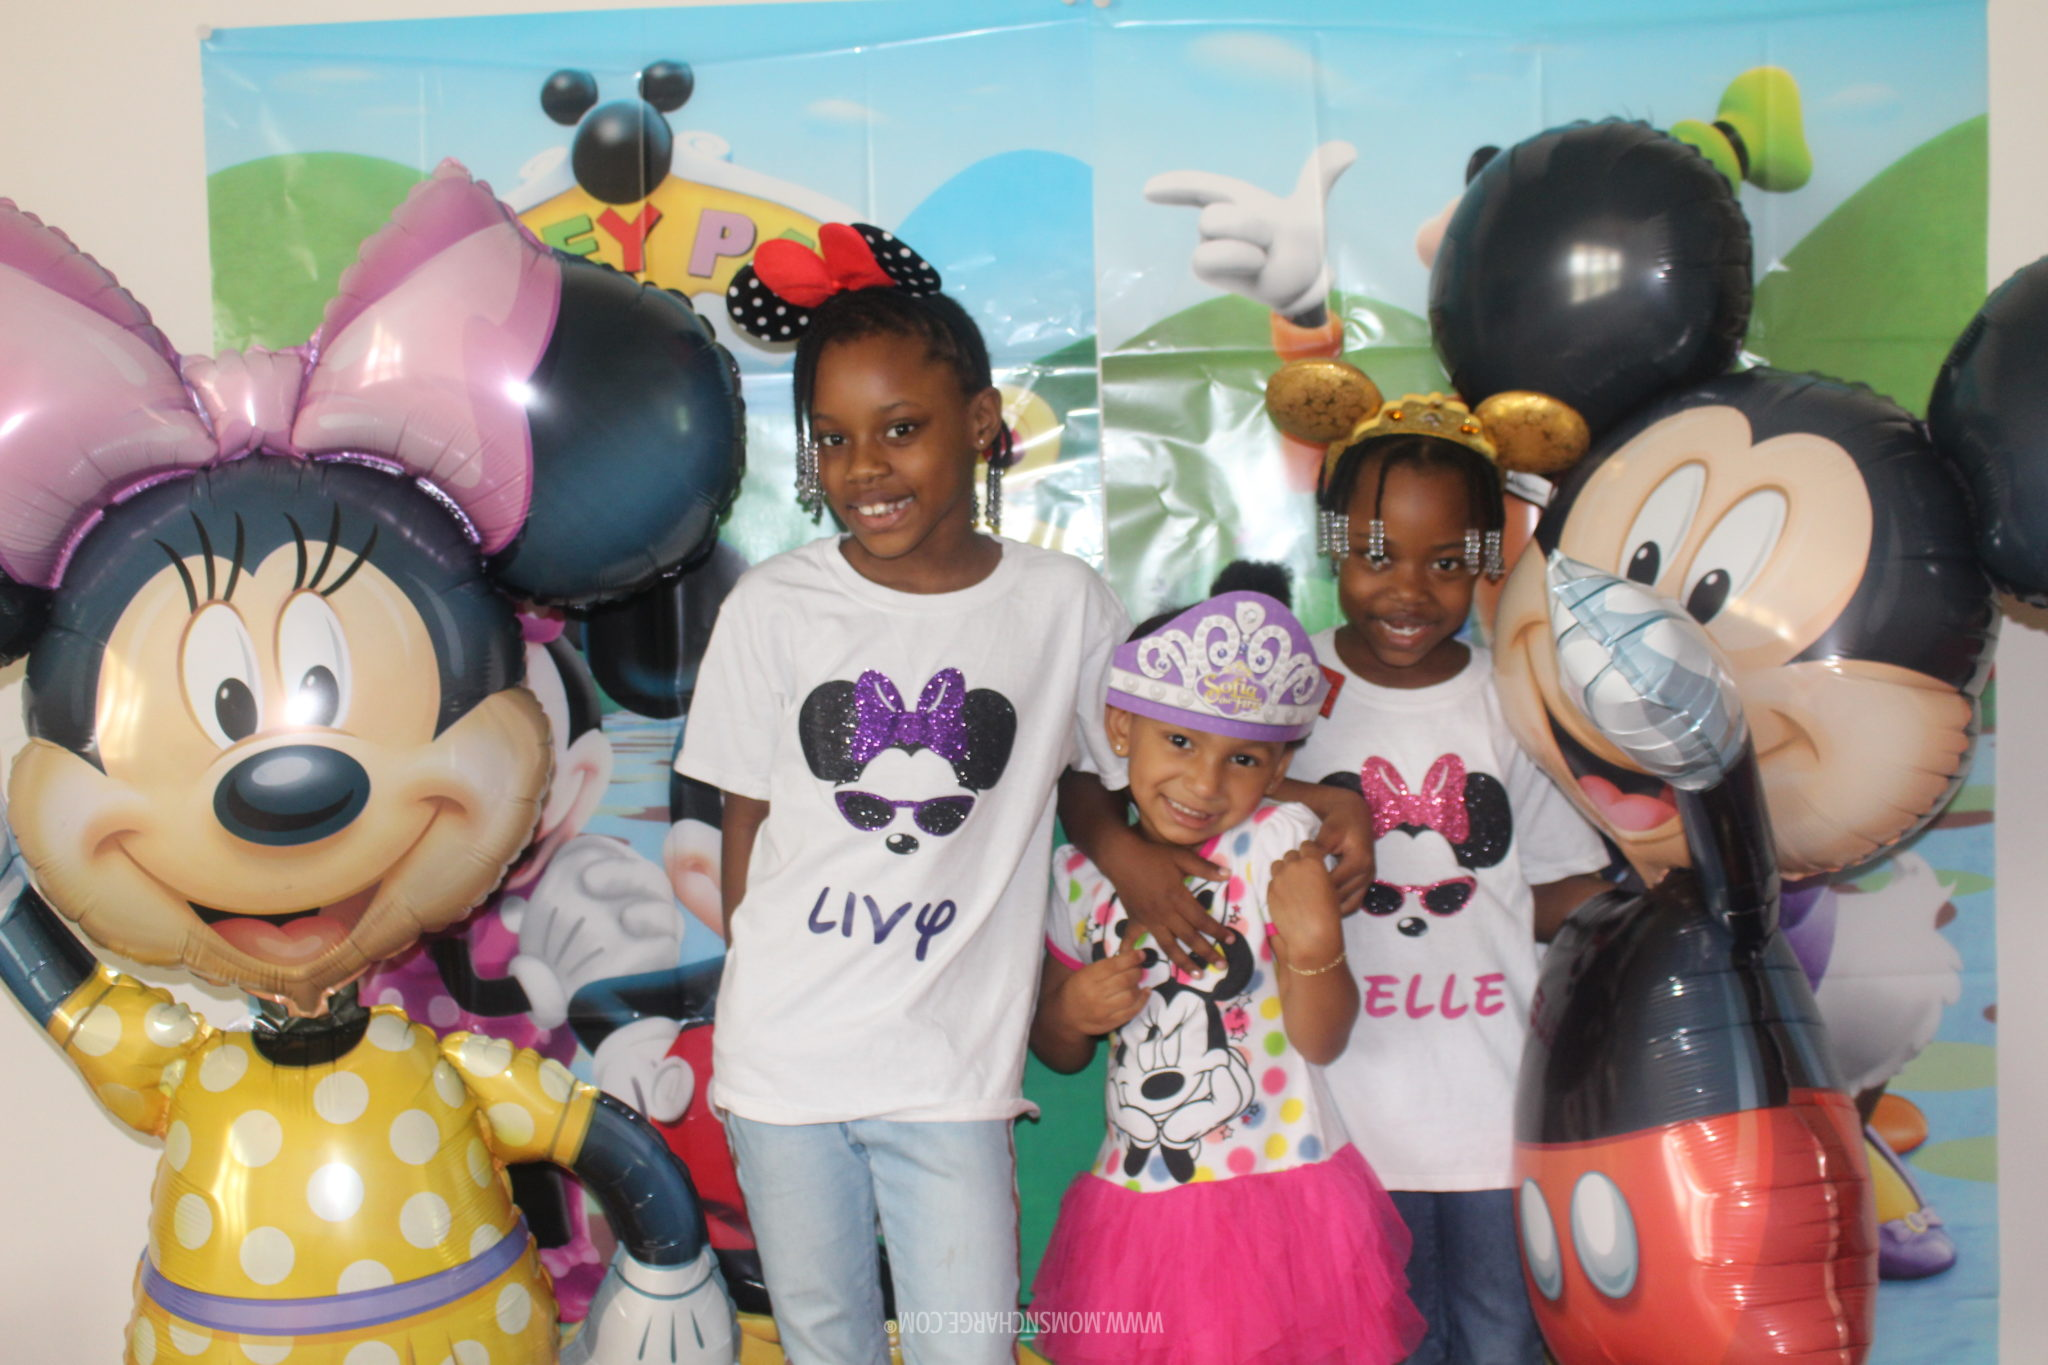 Uncategorized Disney Kids.com 6 things you must have for a super fun disneykids preschool play date moms n